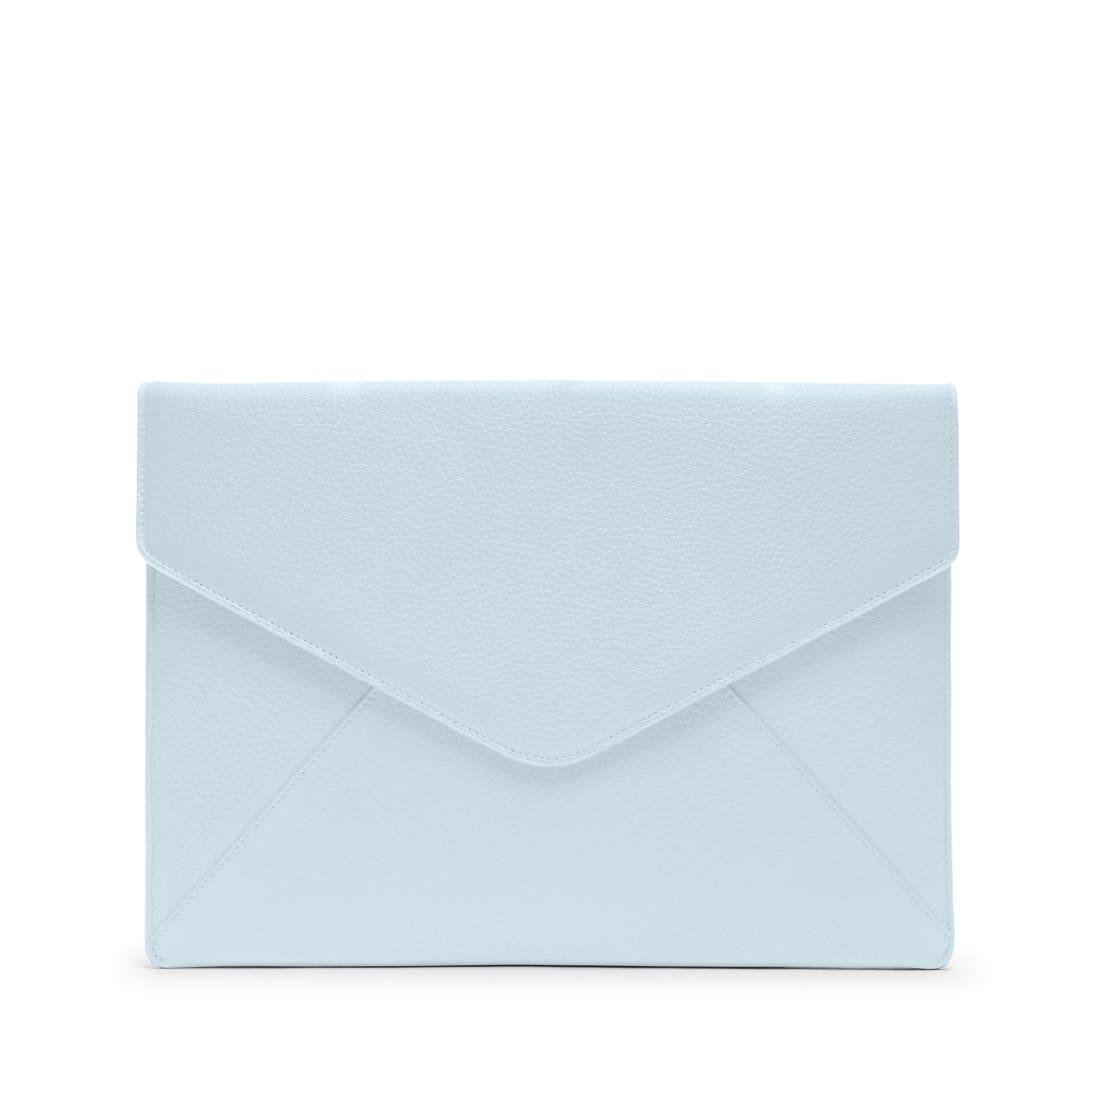 Laptop Envelope Sleeve